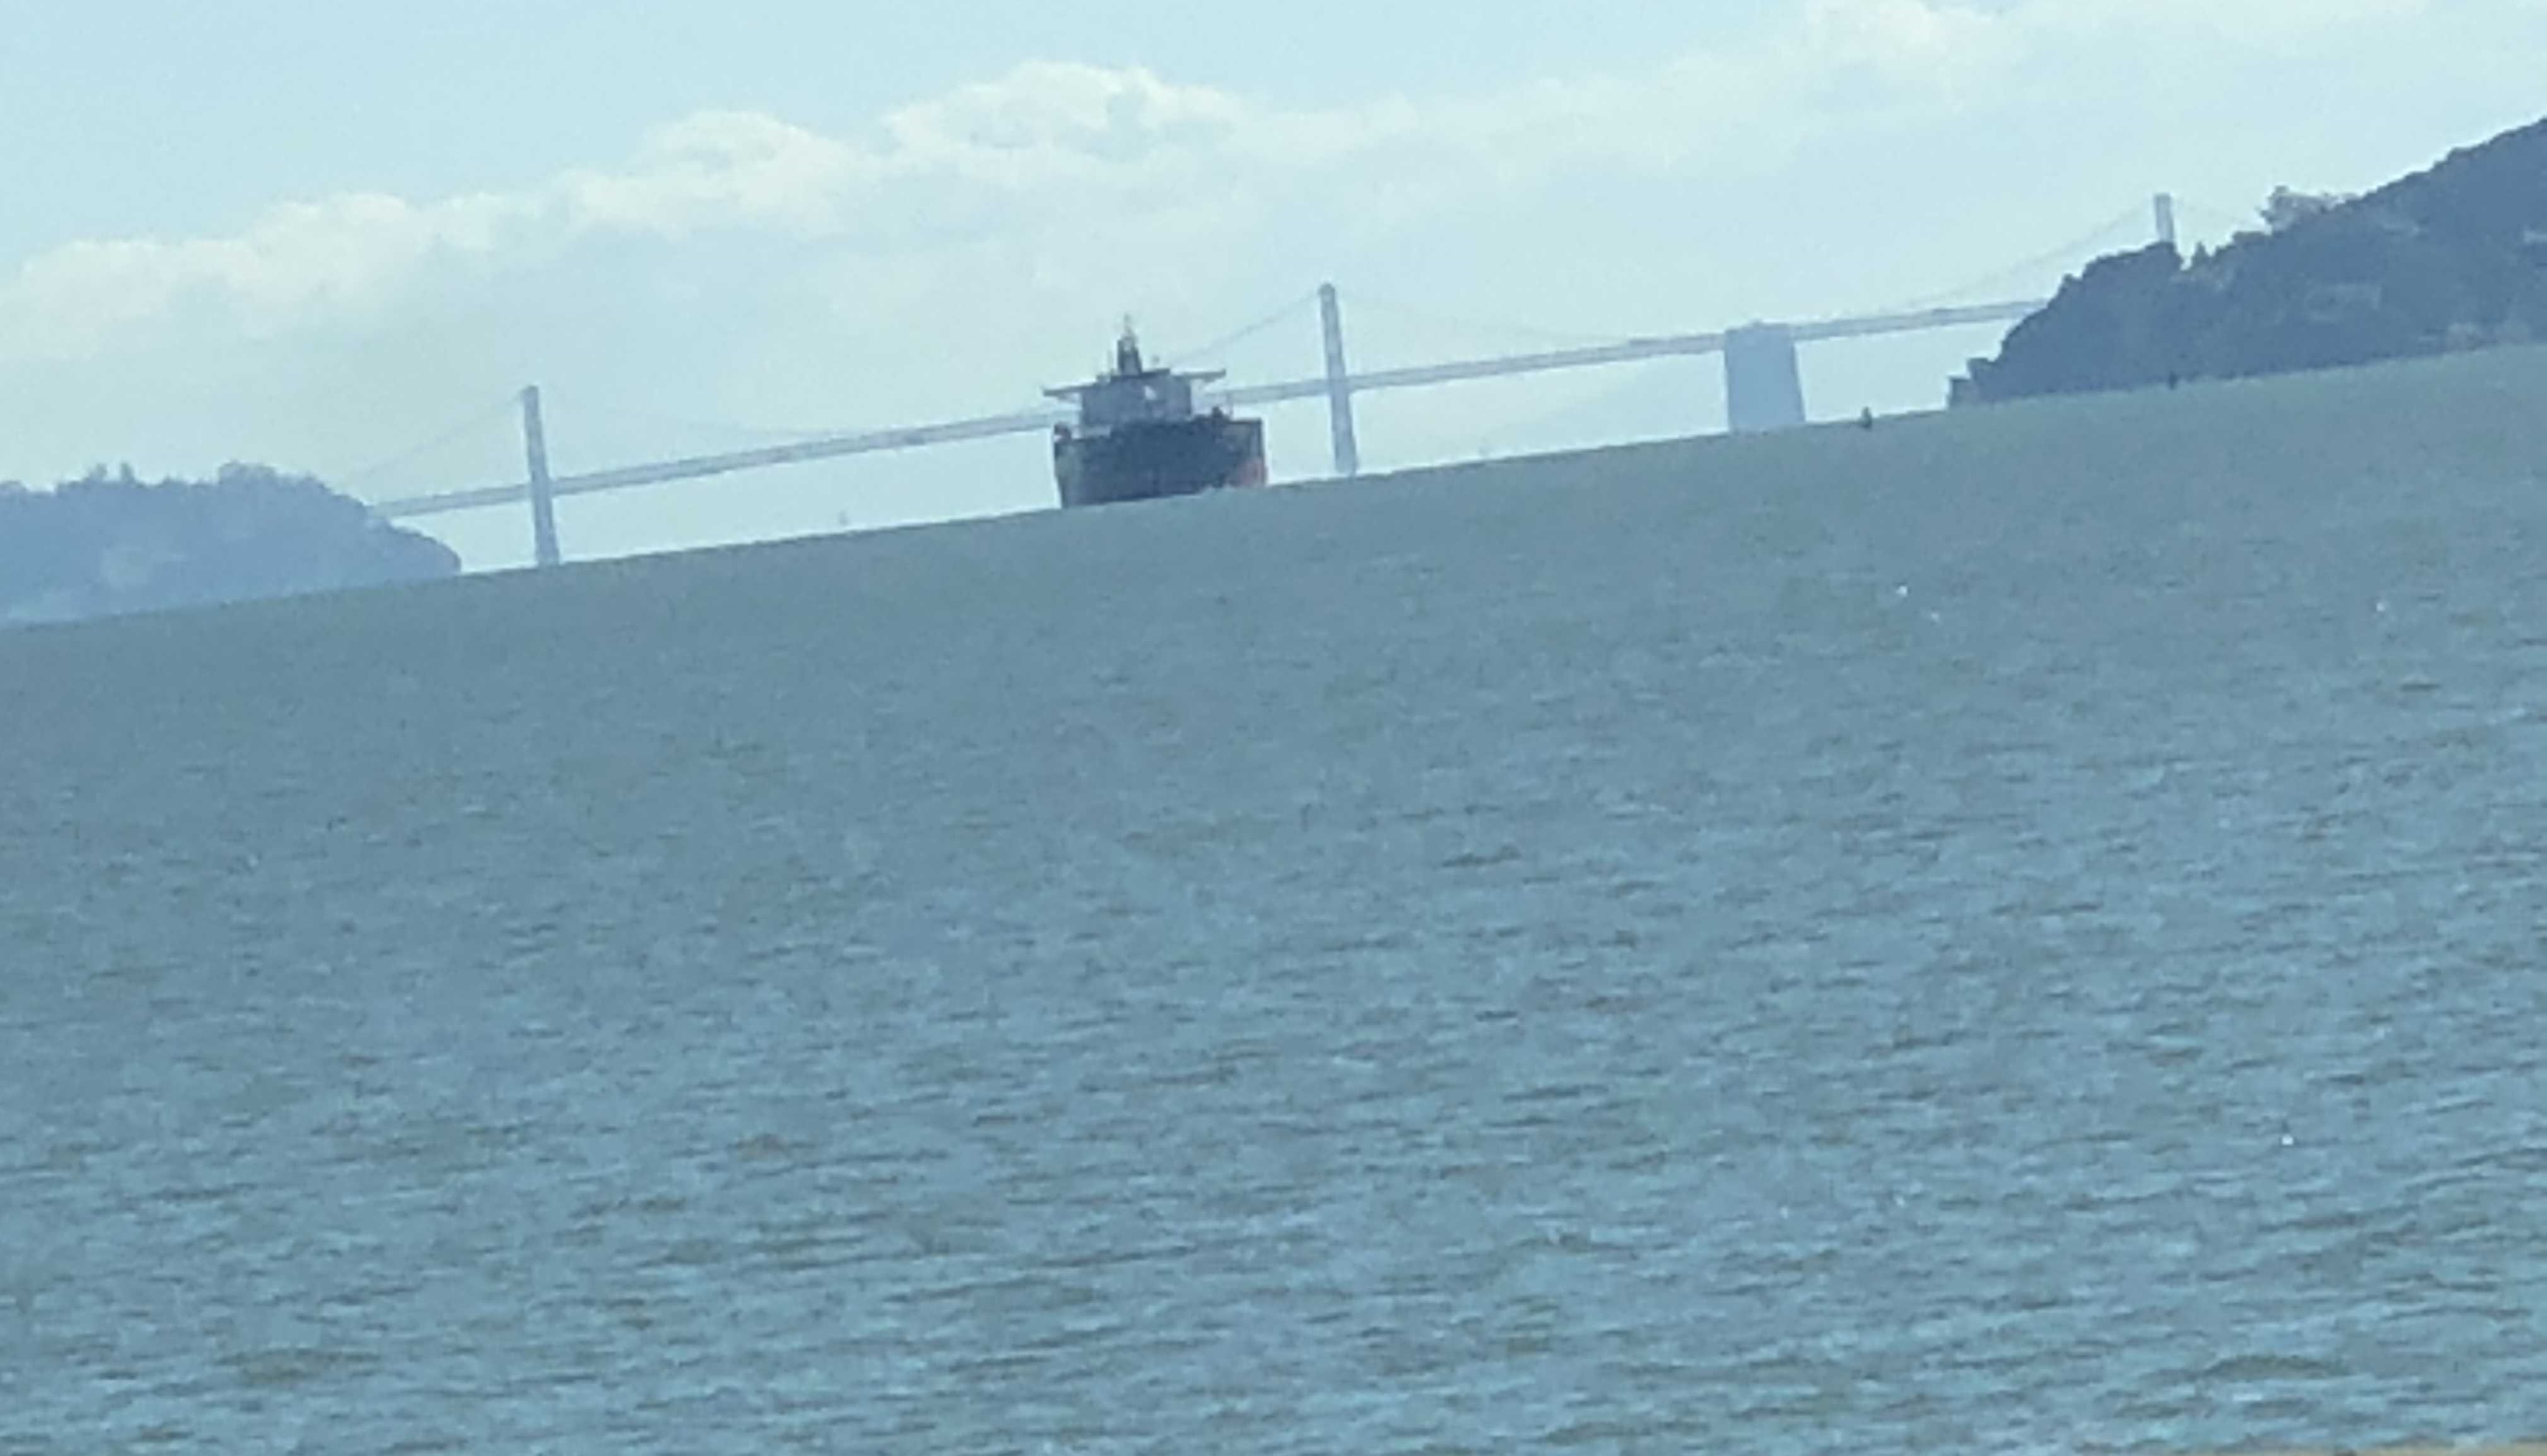 From the Richmond-San Rafael Bridge Feb 21 2018.jpg